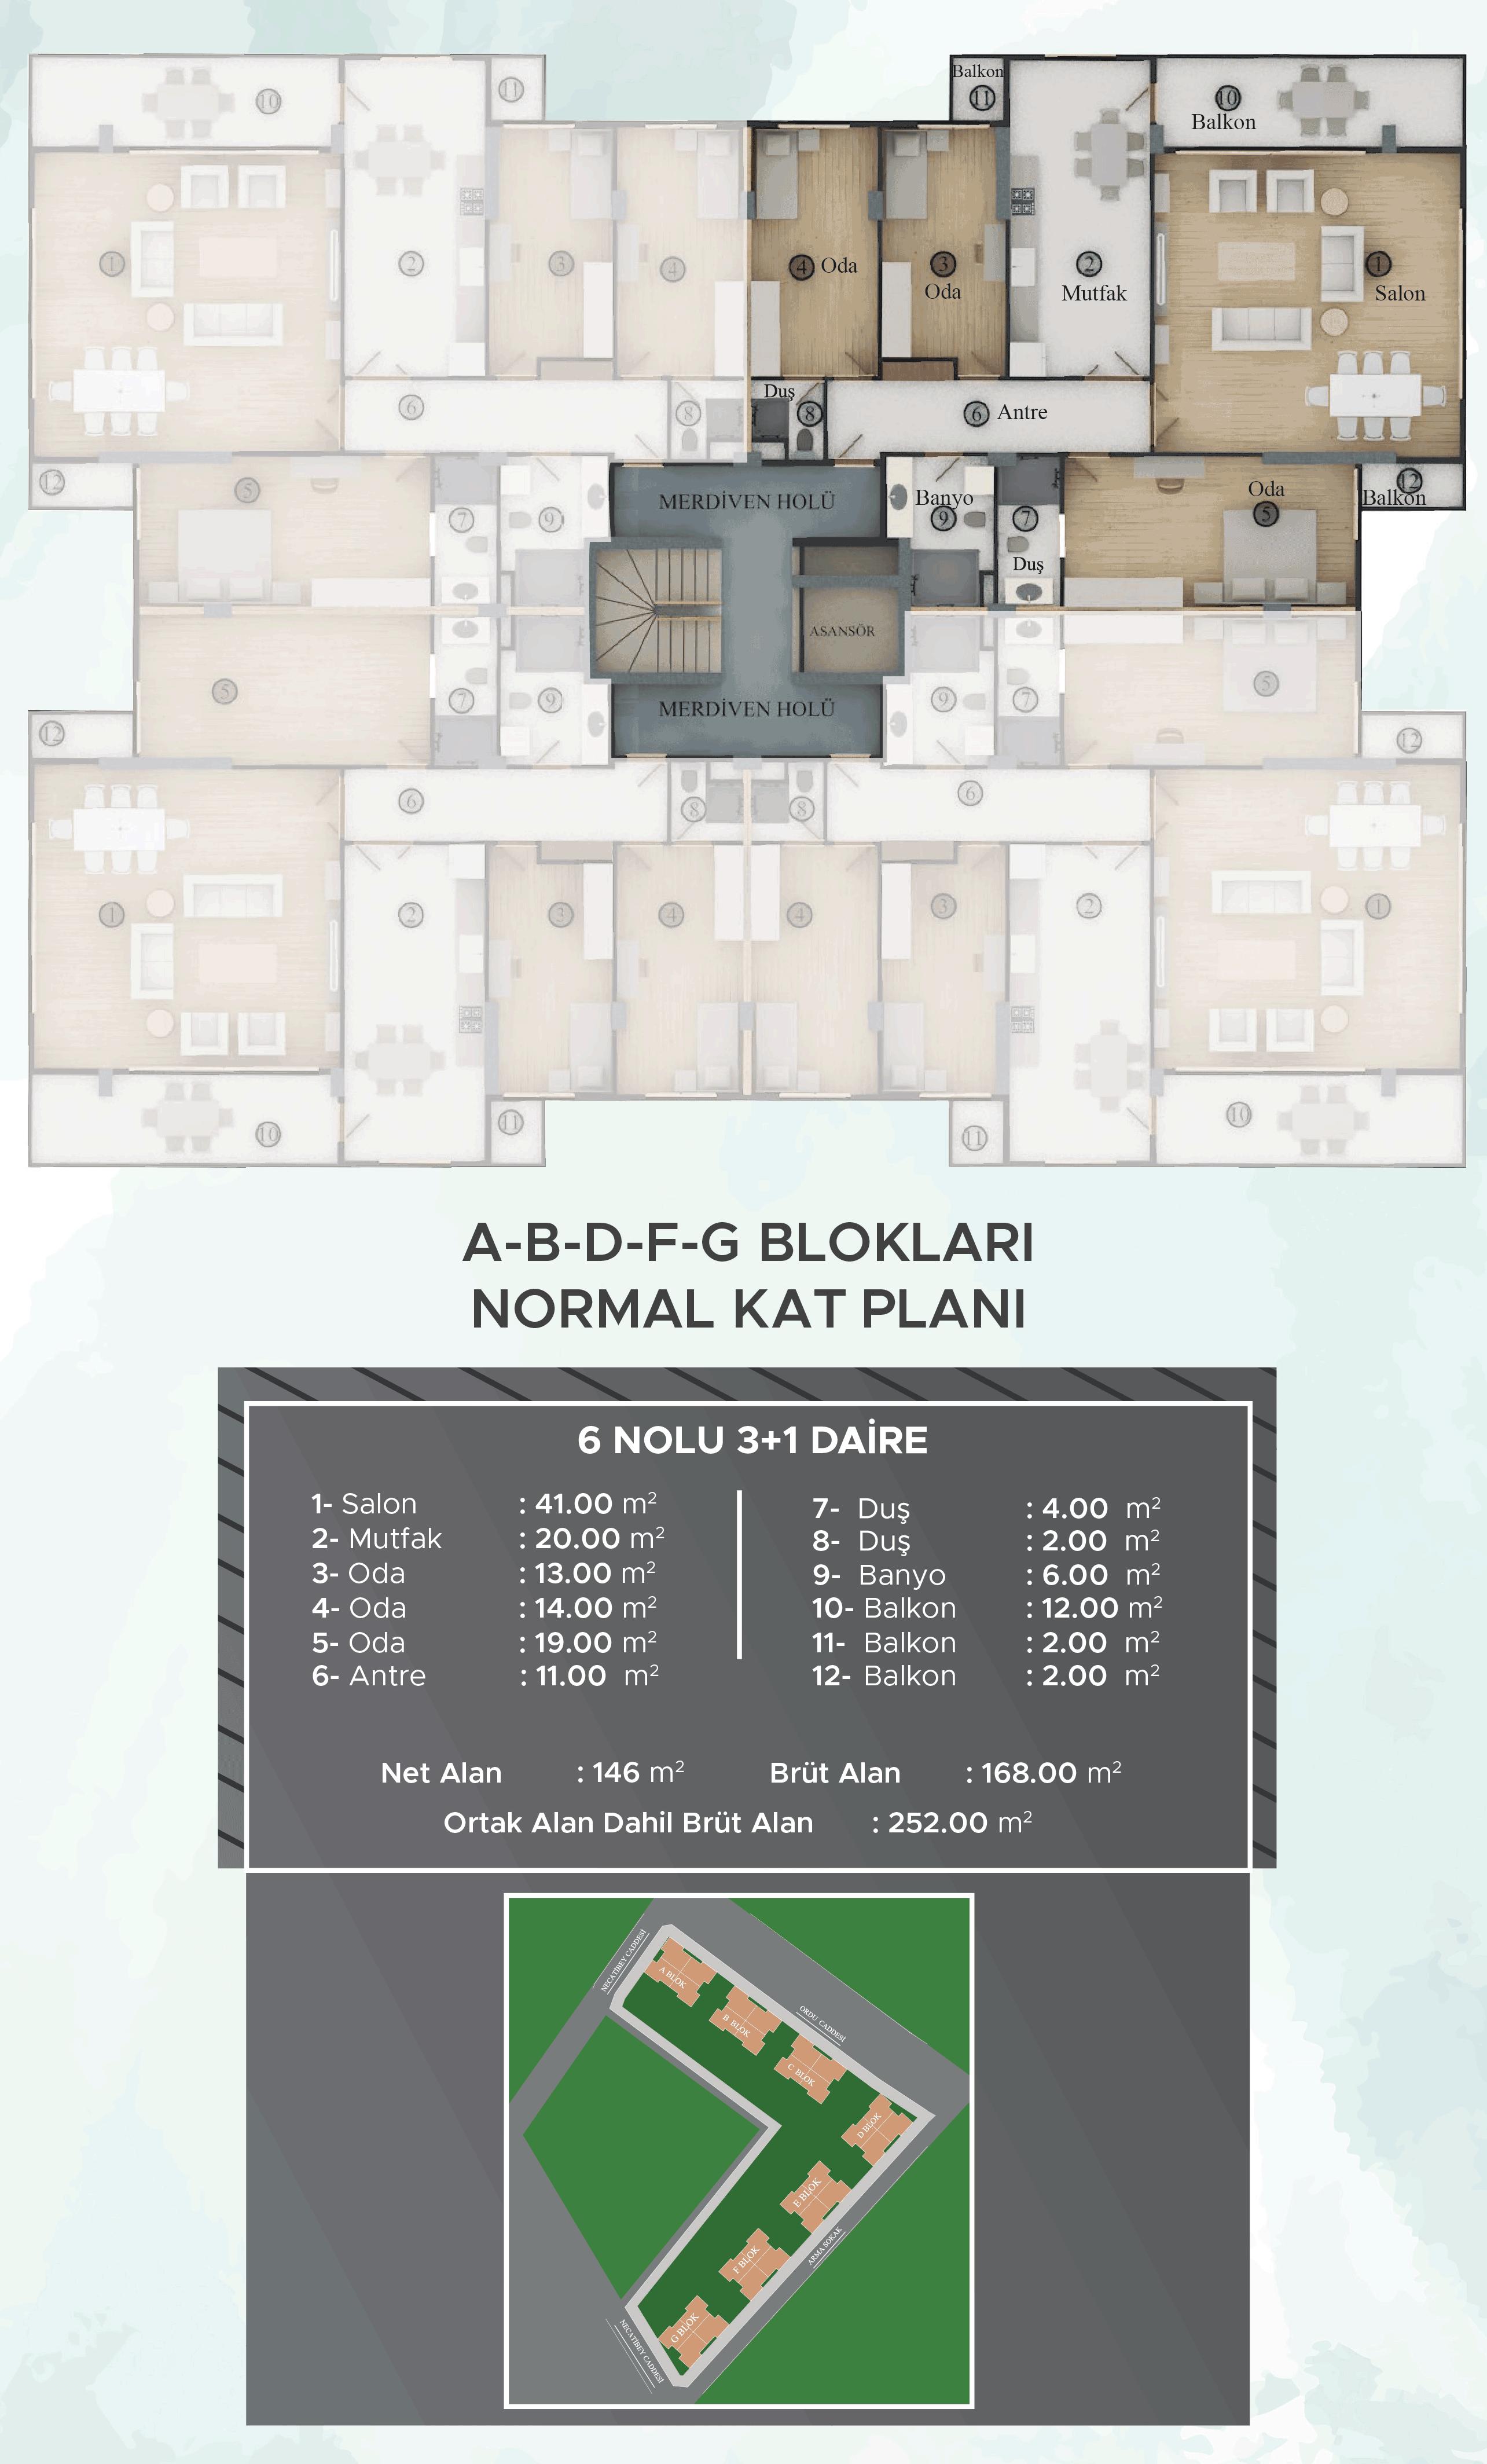 A-B-D-F-G Blokları Normal Kat Planları